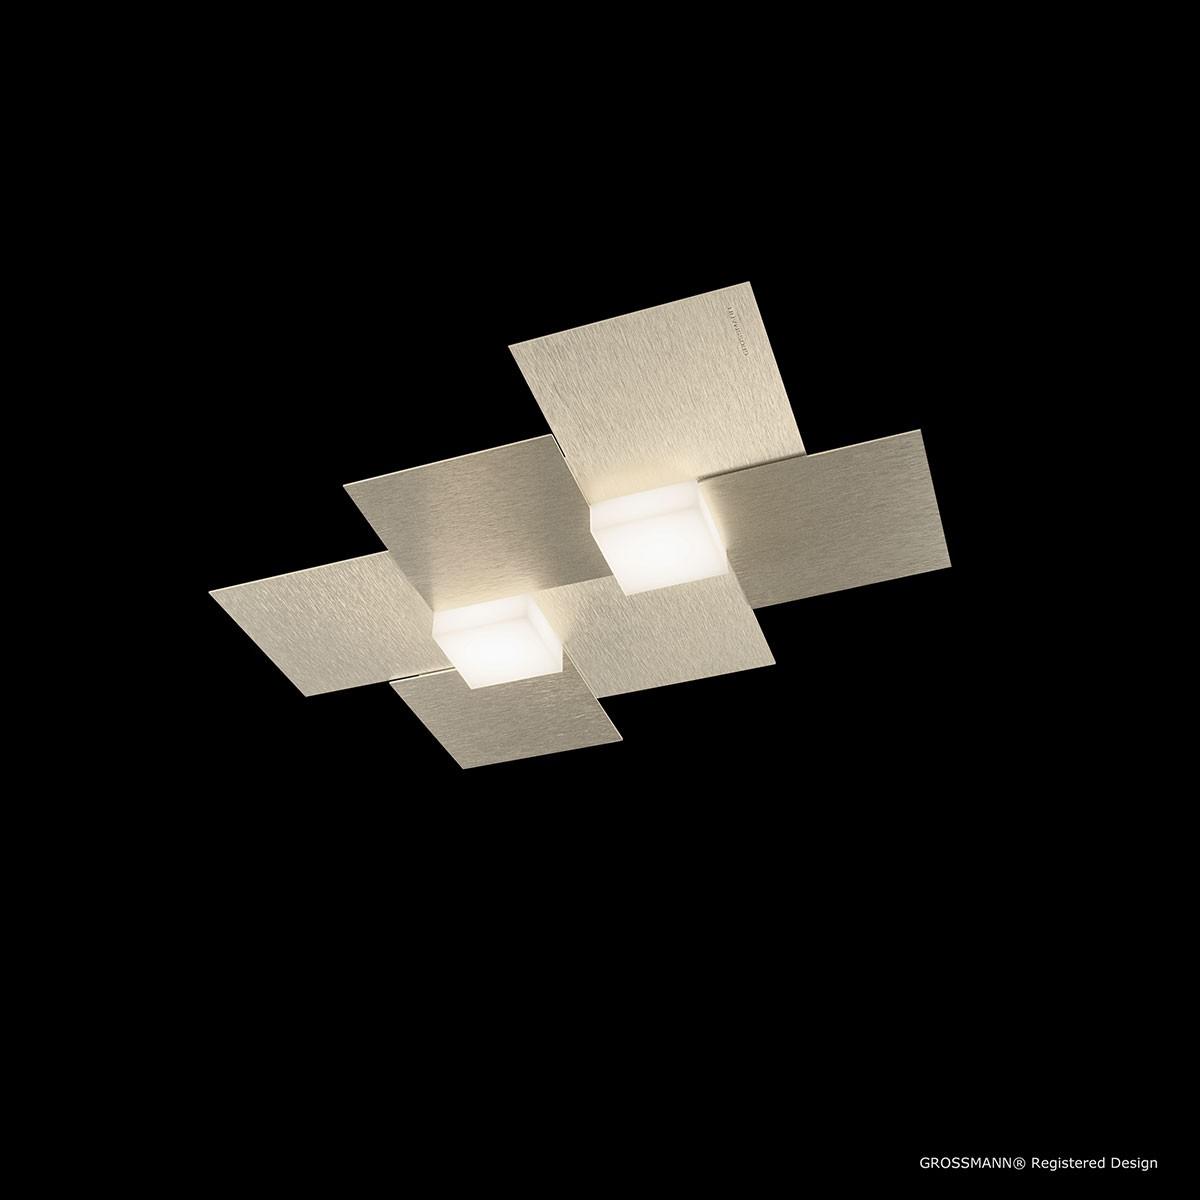 Grossmann Creo LED Wand- / Deckenleuchte, champagner, 33 x 38,5 cm